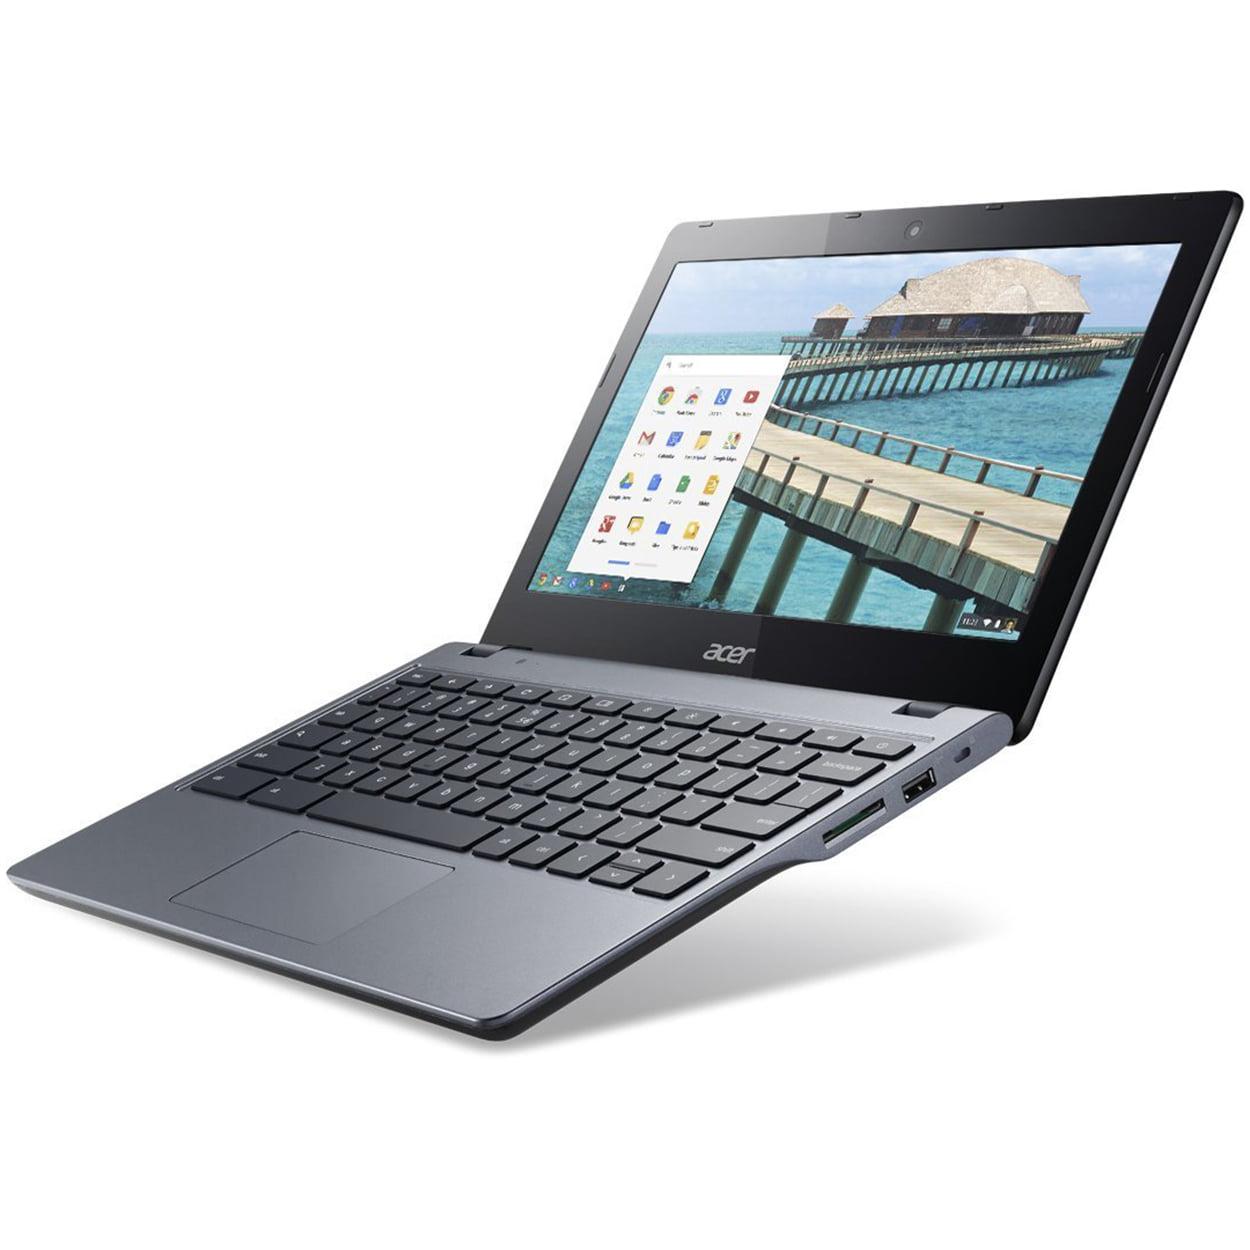 Refurbished Acer C720 Google Chromebook Notebook Laptop 11.6-Inch LED 4GB RAM 16GB SSD